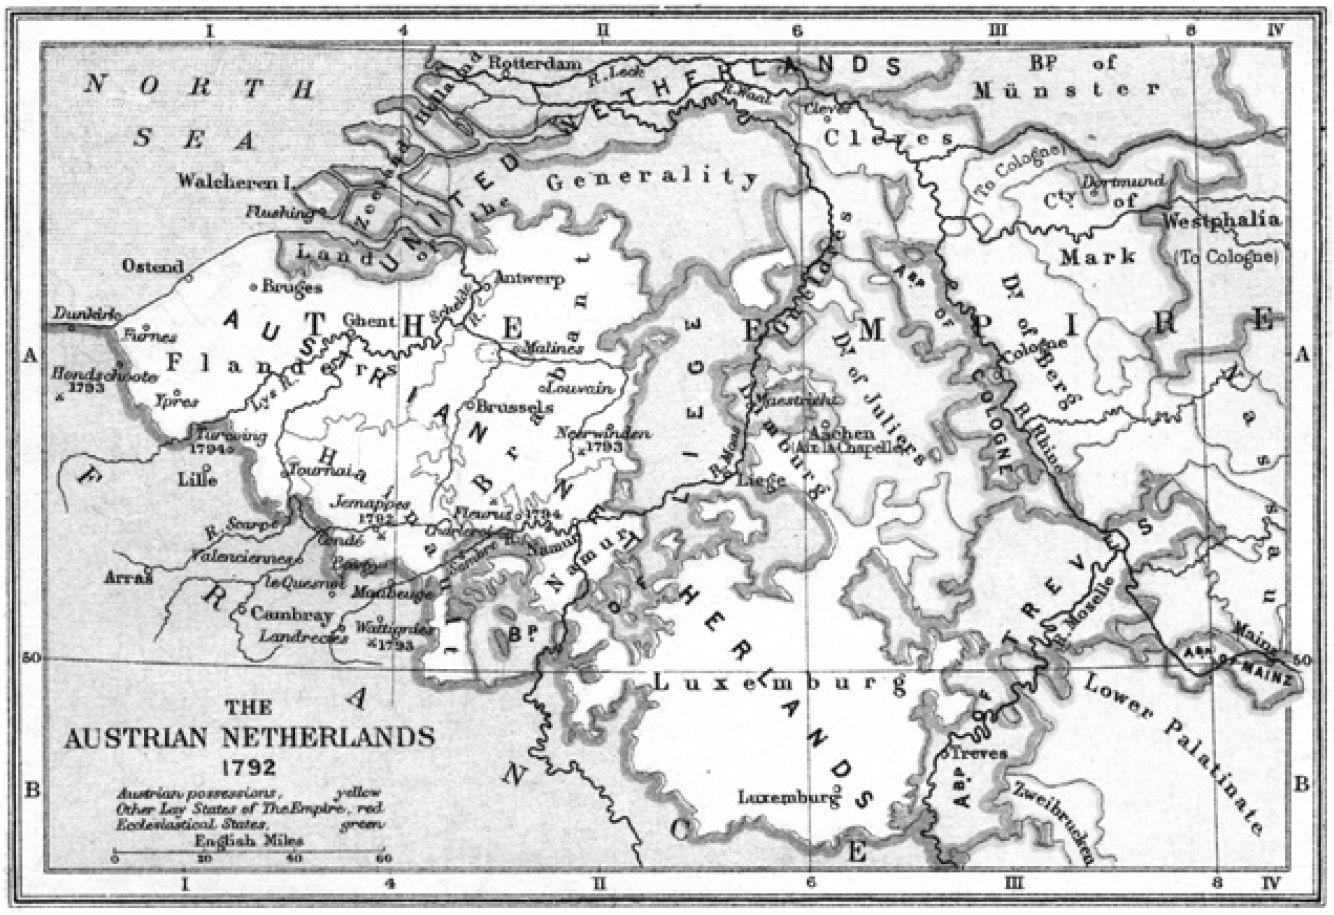 'The Austrian Netherlands 1792', in: Samuel R. Gardiner, A School Atlas of English History, 1892, kaart 47